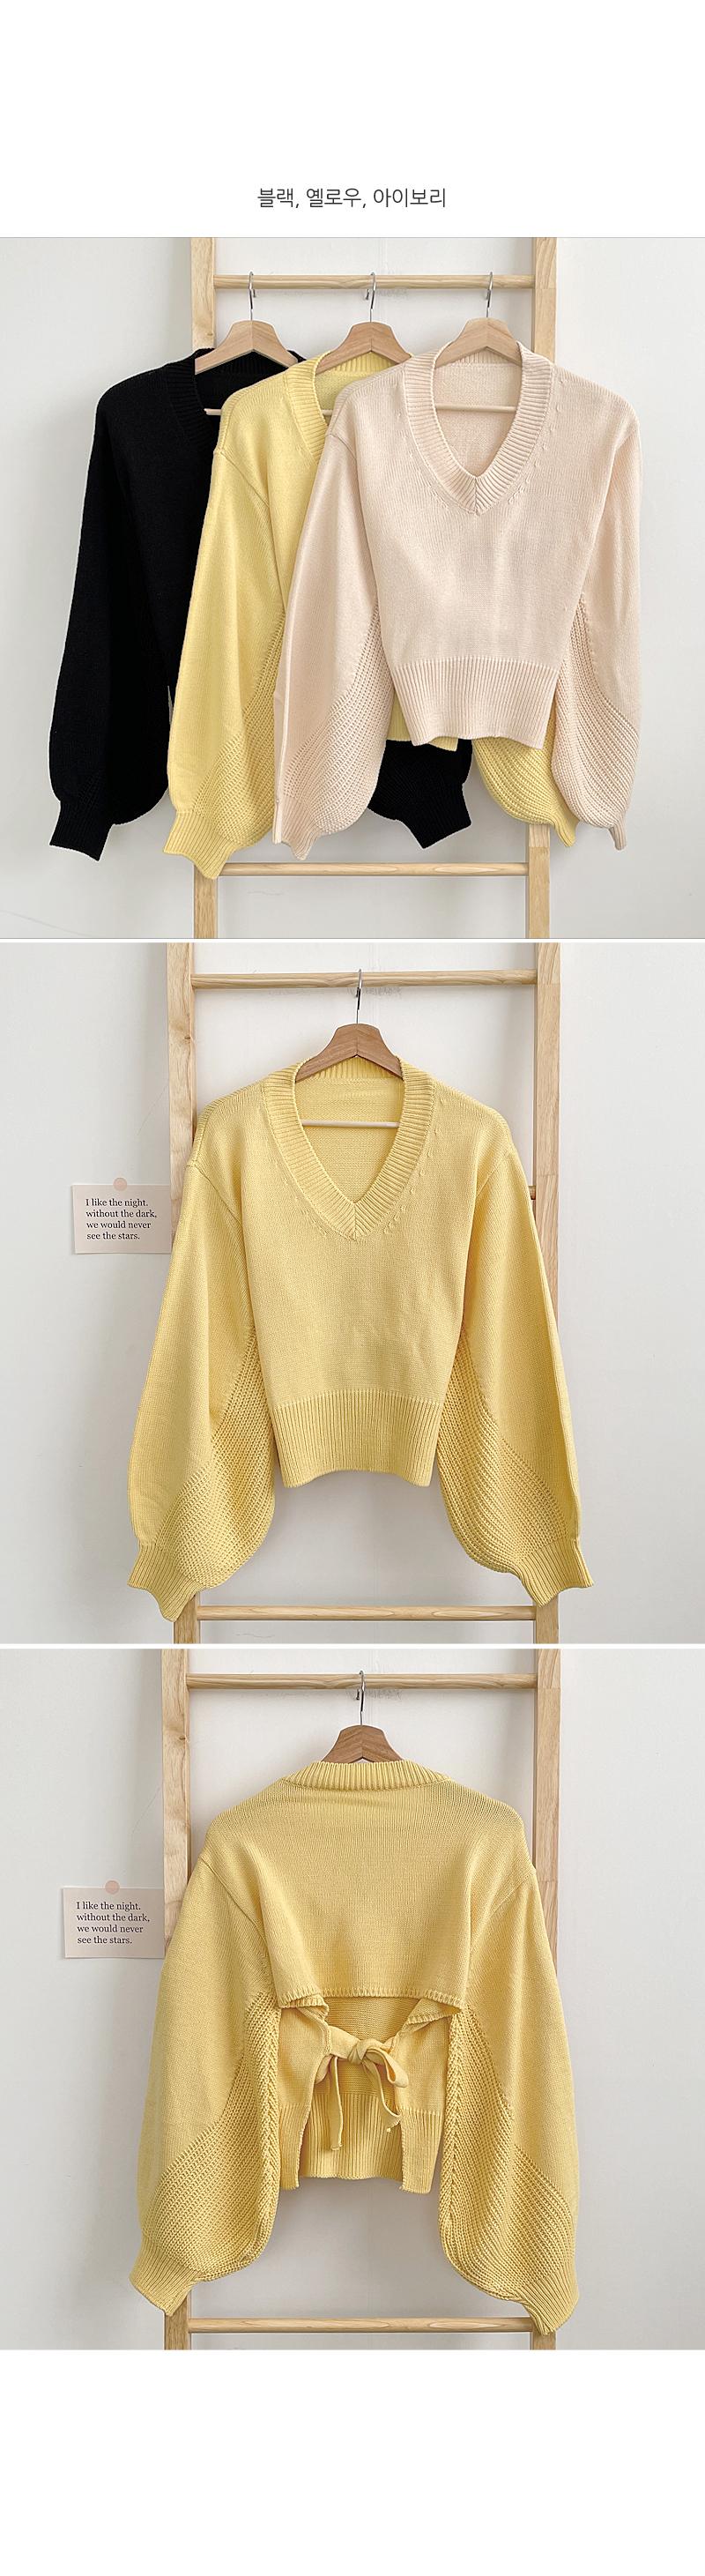 Ari Back Ribbon Knitwear